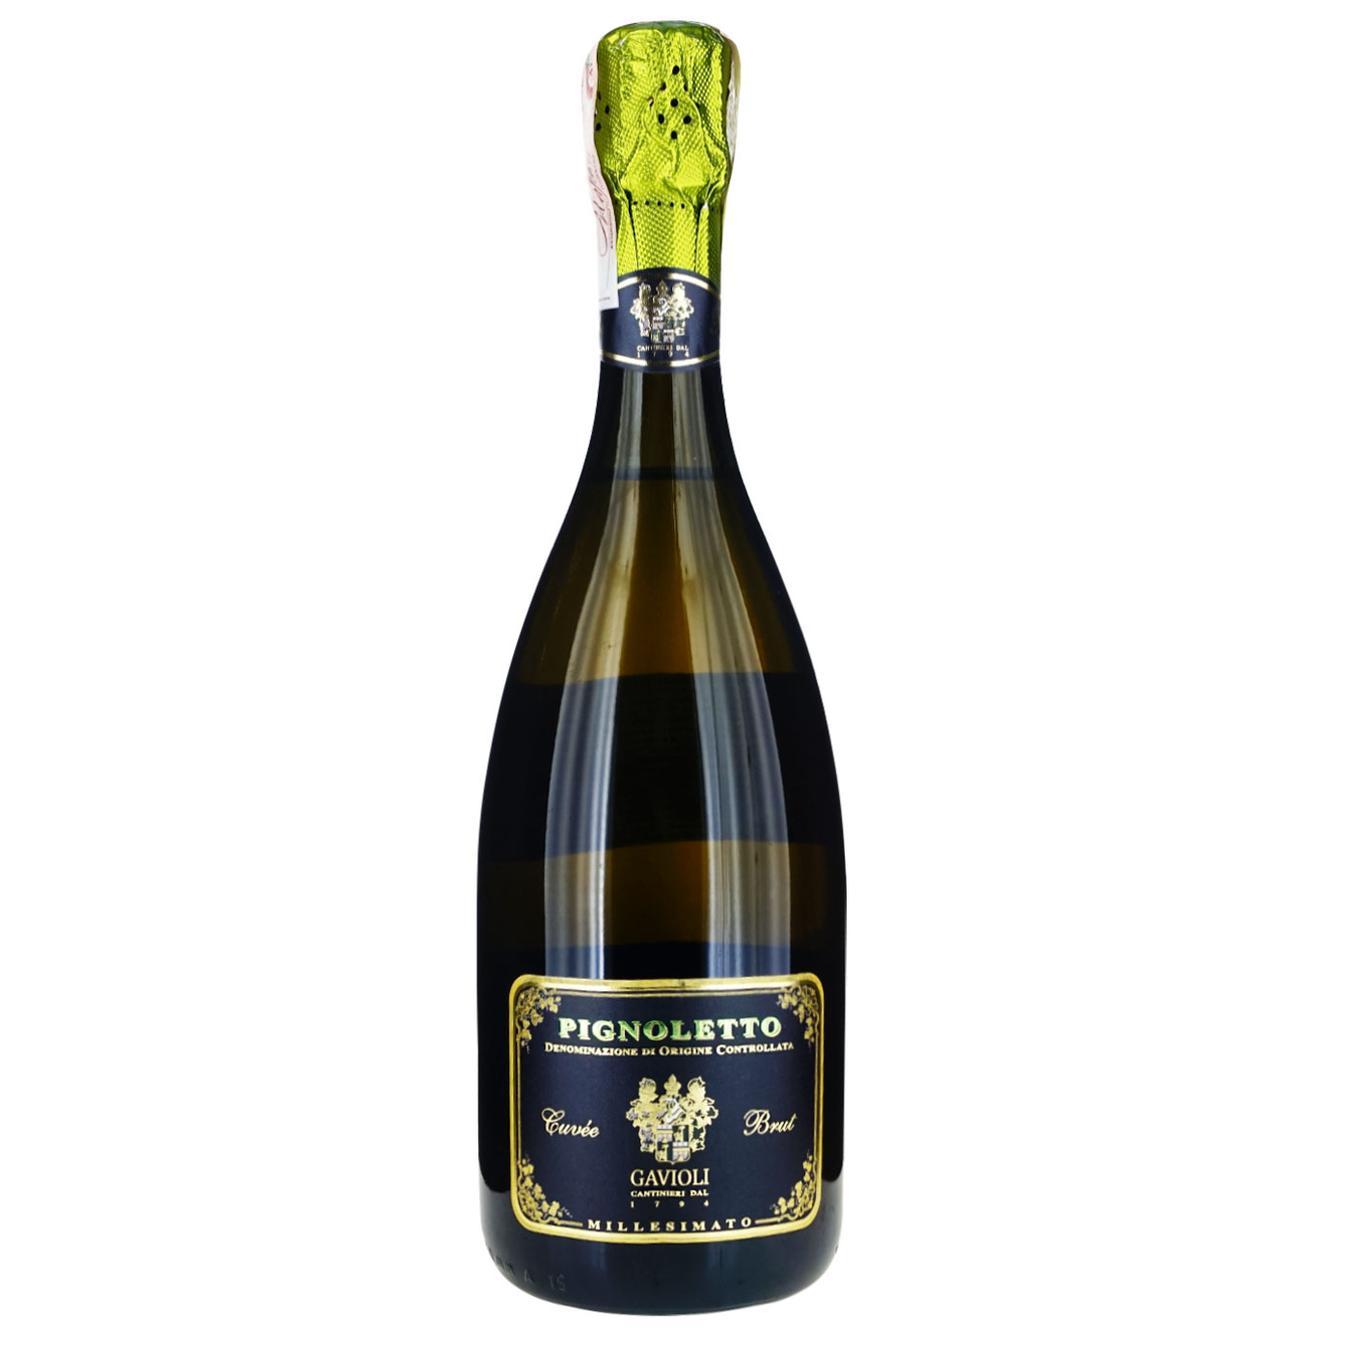 Вино игристое Giacobazzi Pignoletto Gavioli Brut 11.5% 0,75л